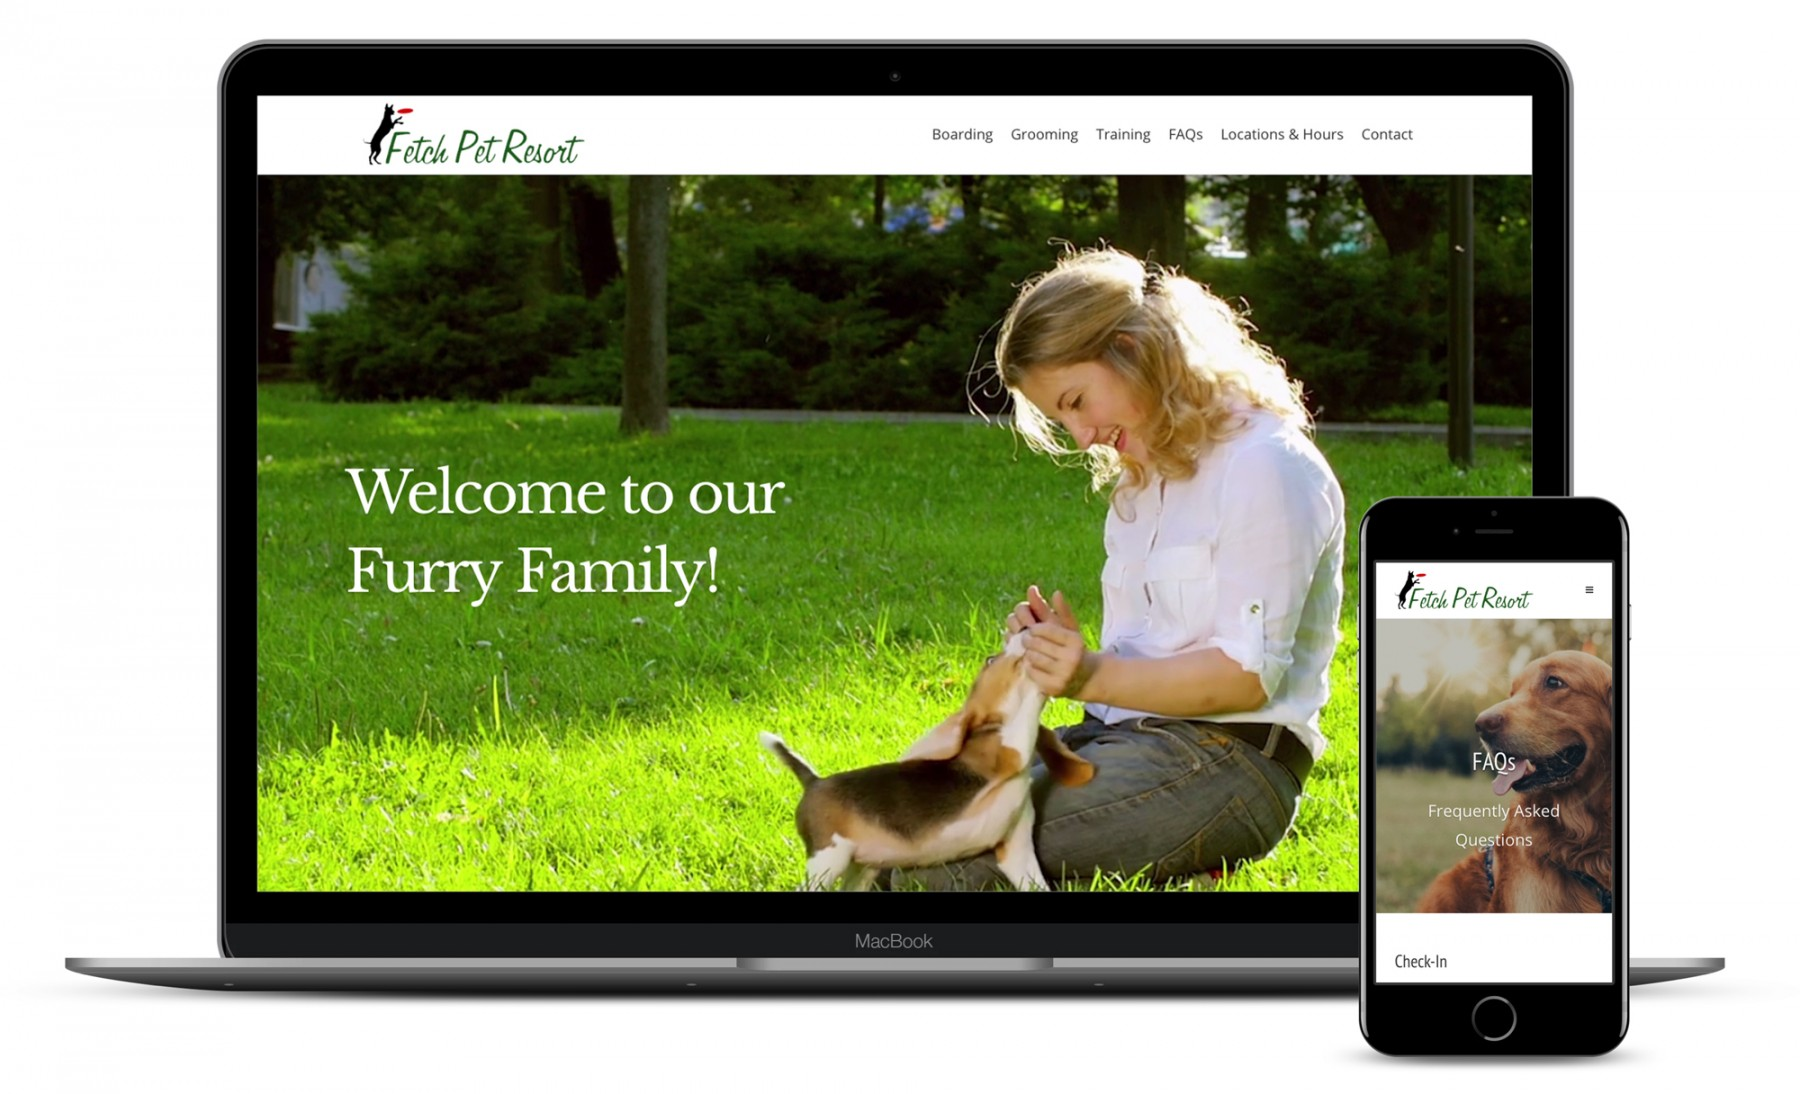 Fetch Pet Resort Website Design